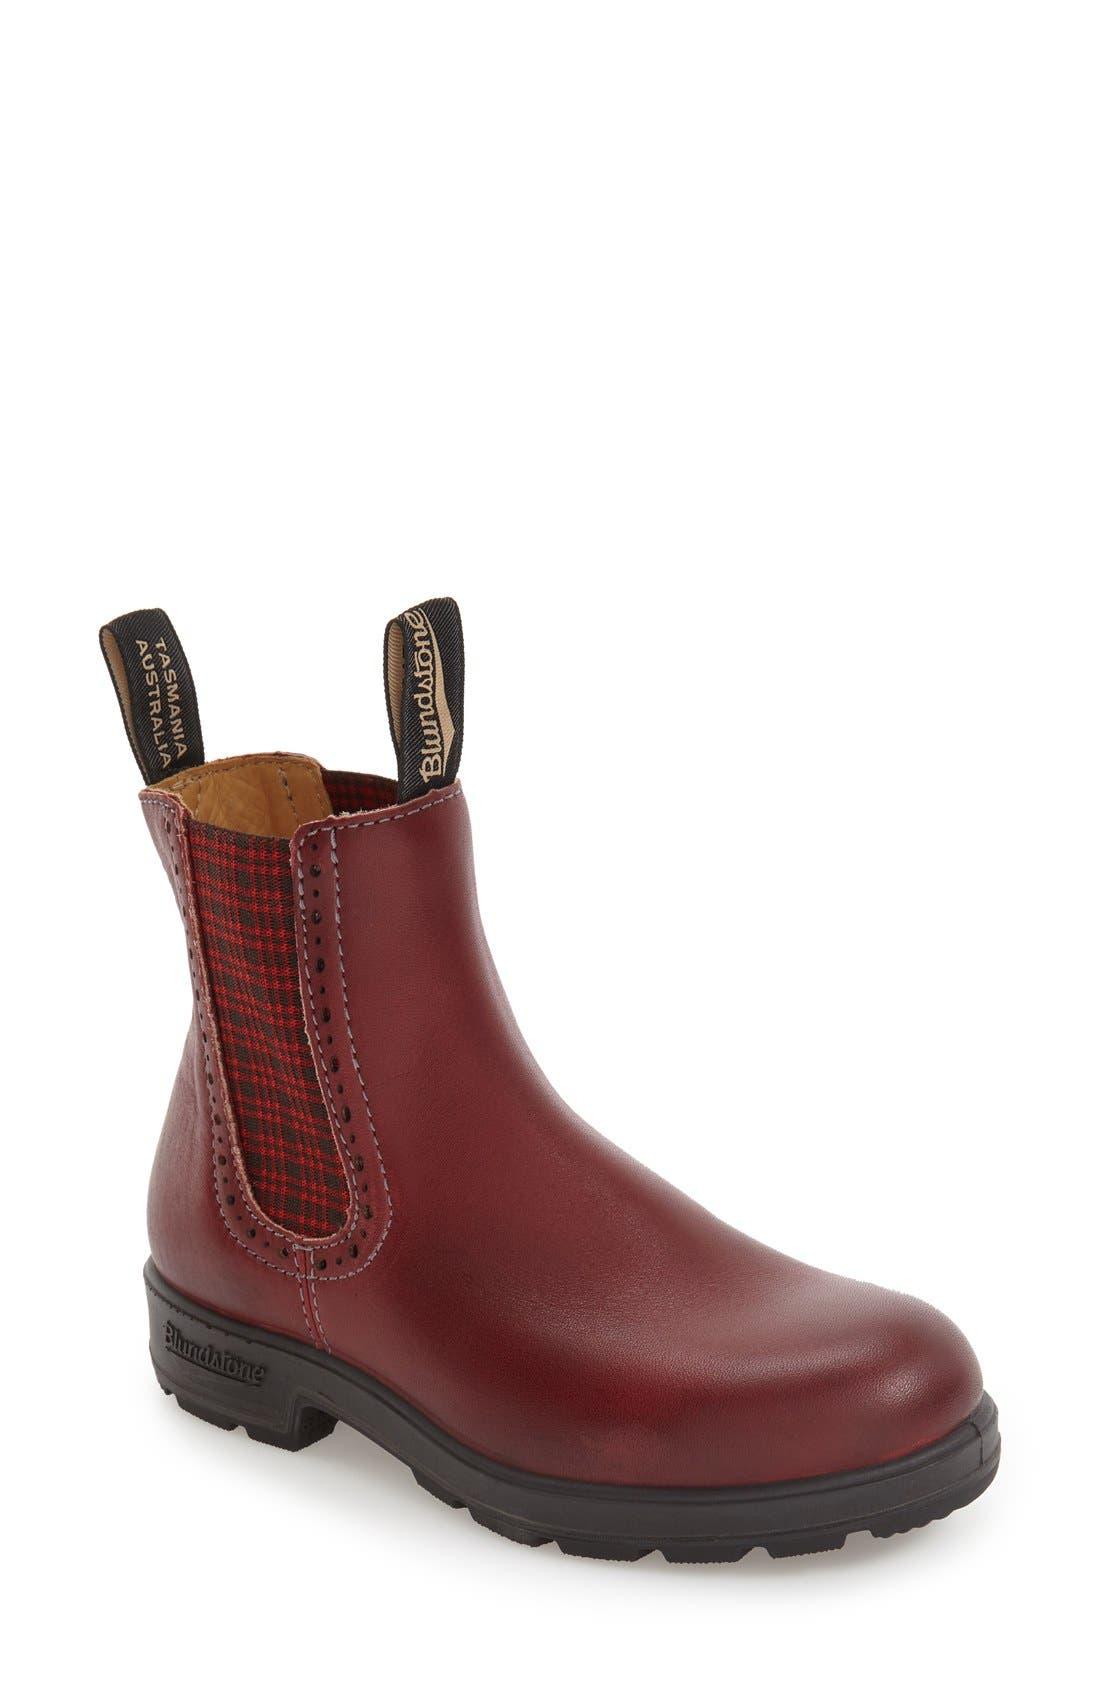 Main Image - Blundstone Footwear 'Original Series' Water Resistant Chelsea Boot (Women)